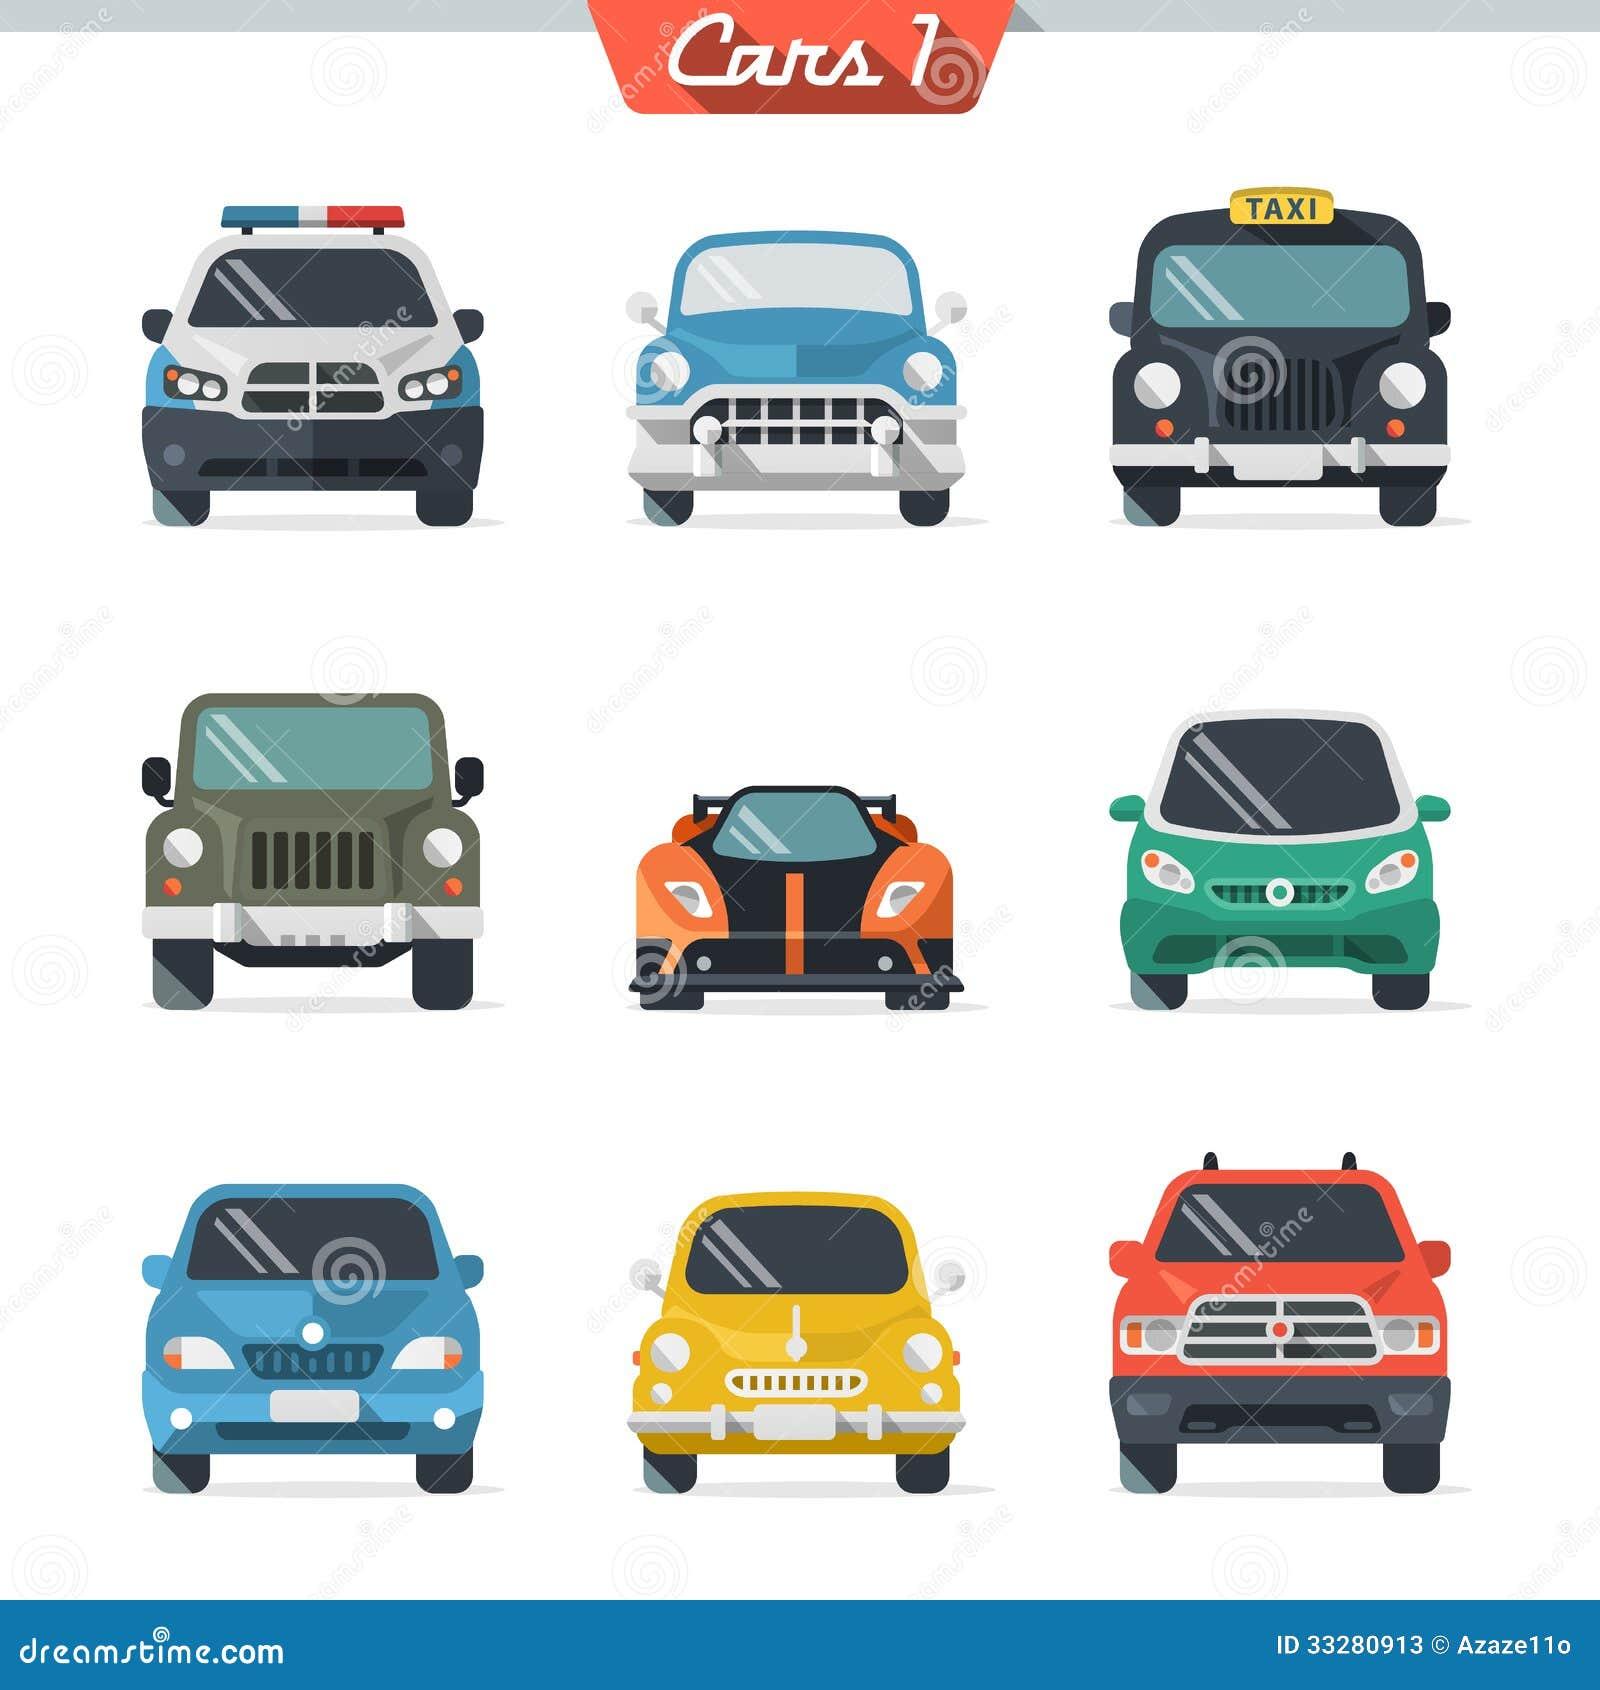 Car Icon Set 1 Stock Vector. Illustration Of Blue